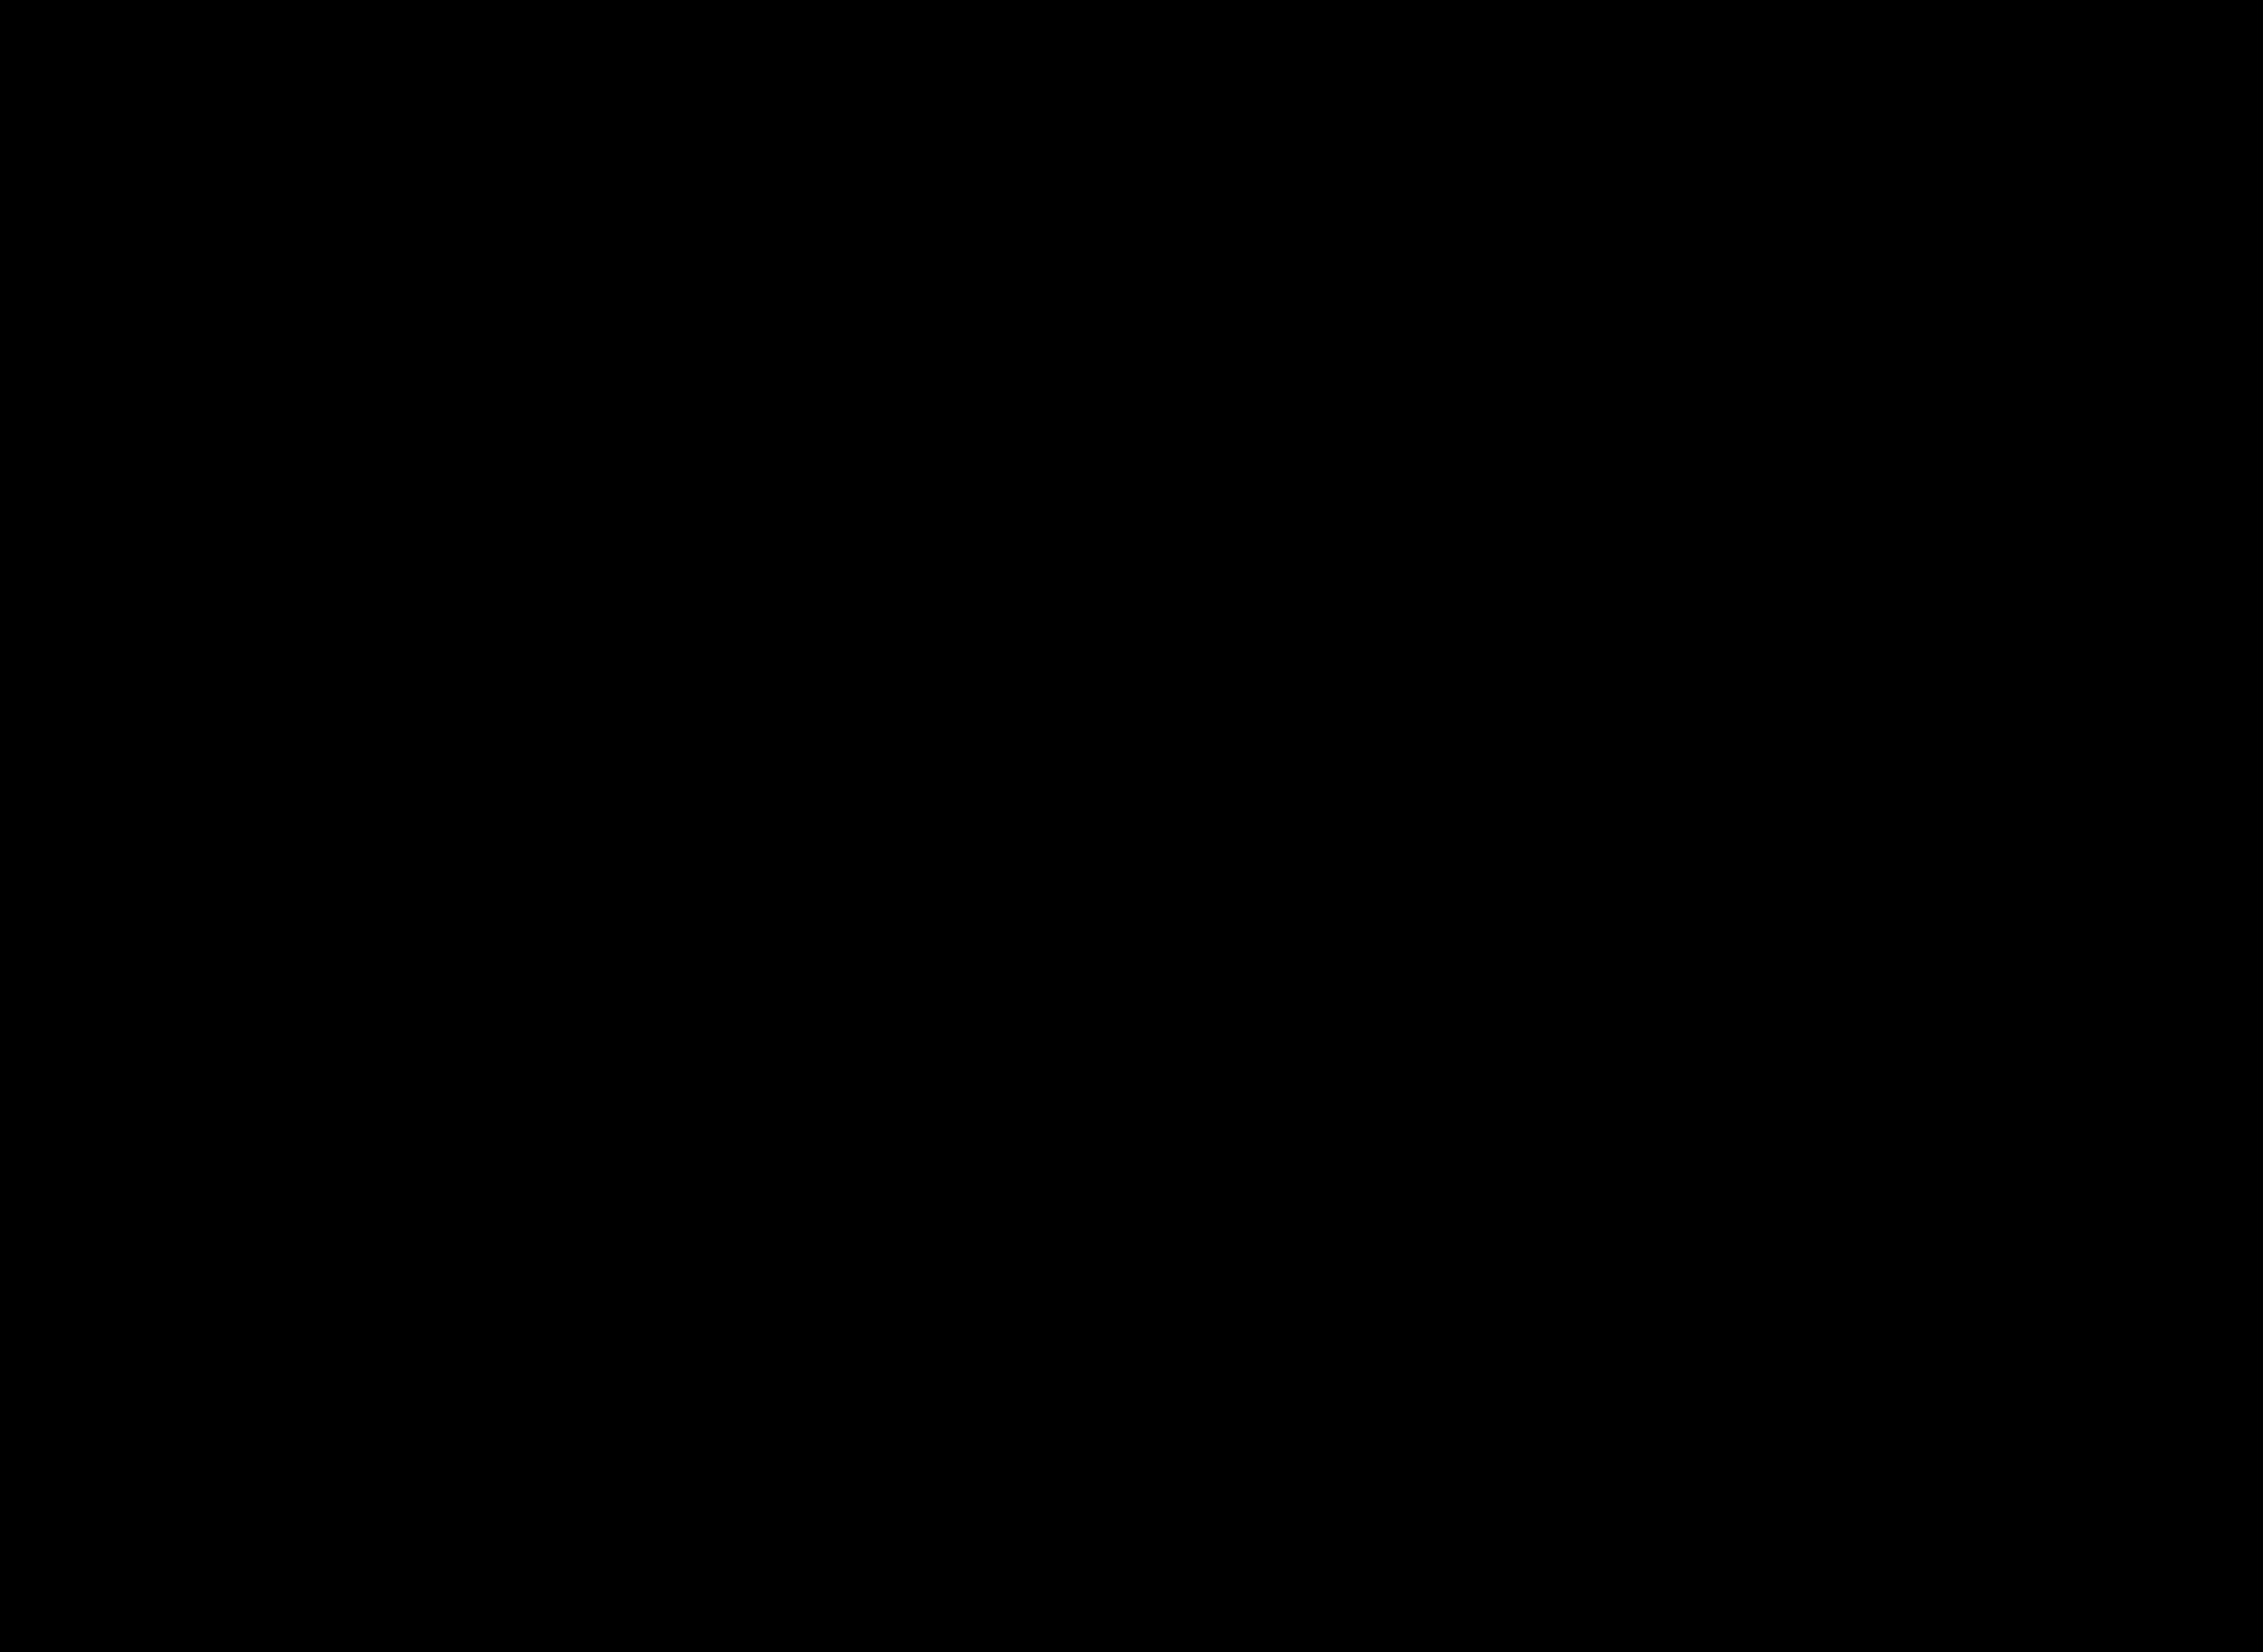 Best traits of gemini clipart clip free download Zodiac Signs Clipart | Free download best Zodiac Signs Clipart on ... clip free download